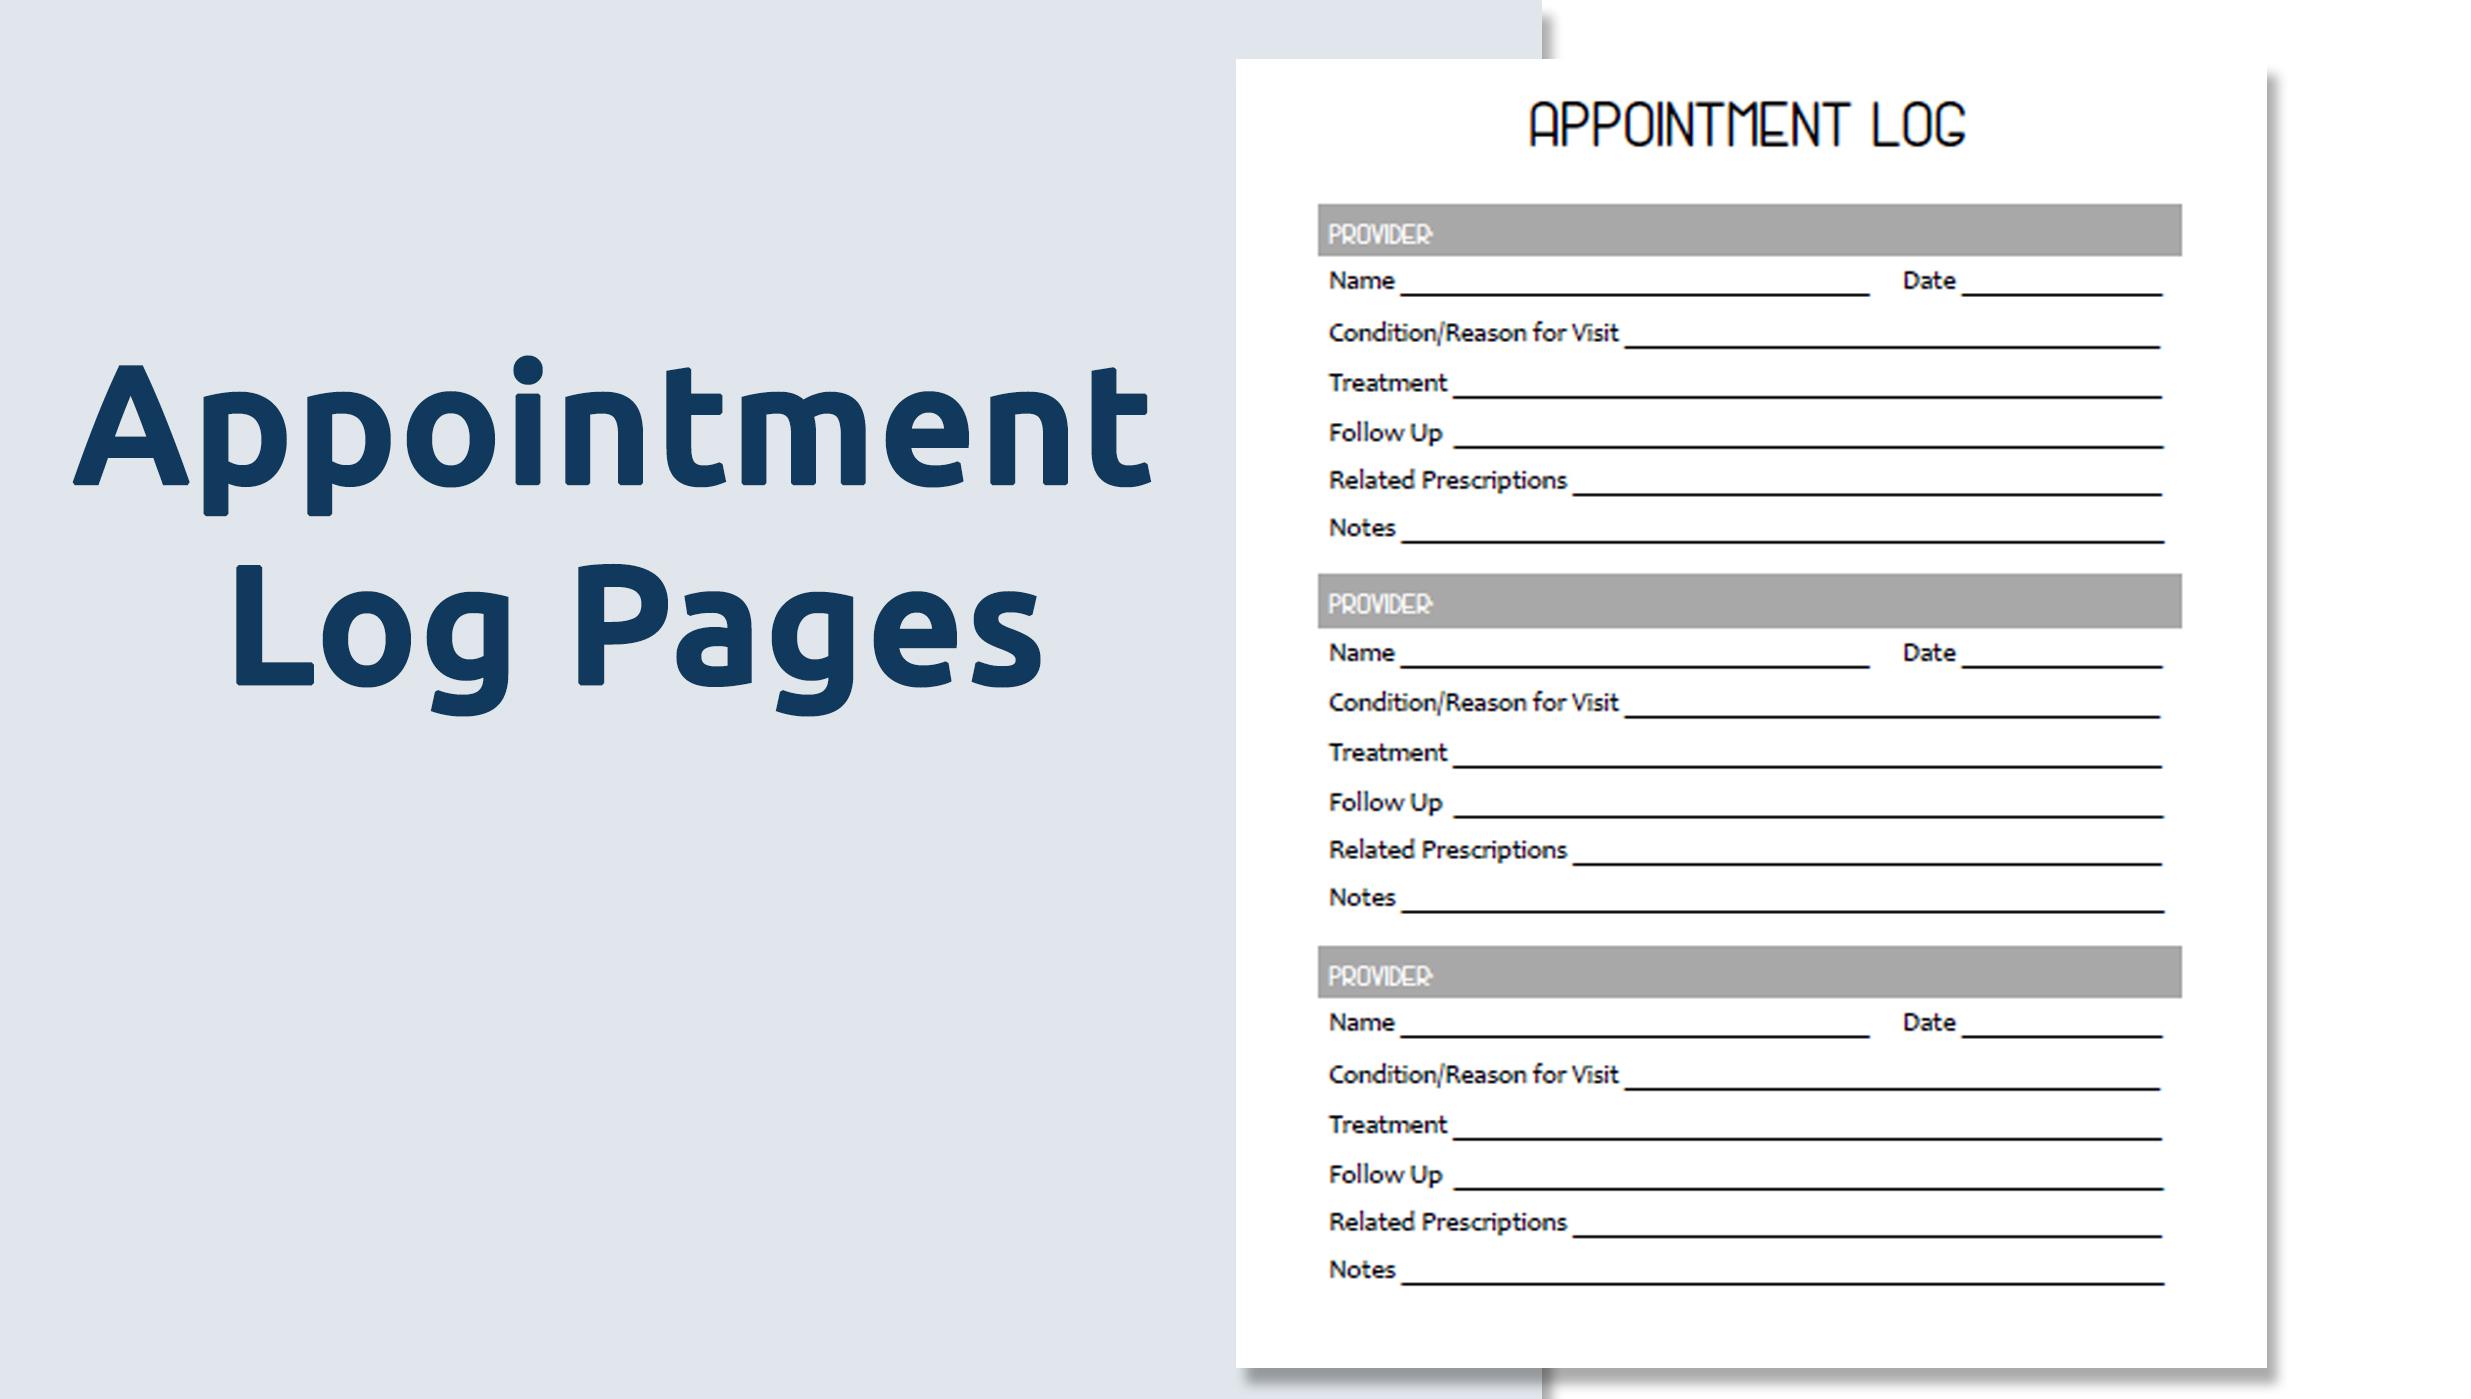 Appointment Log.jpg